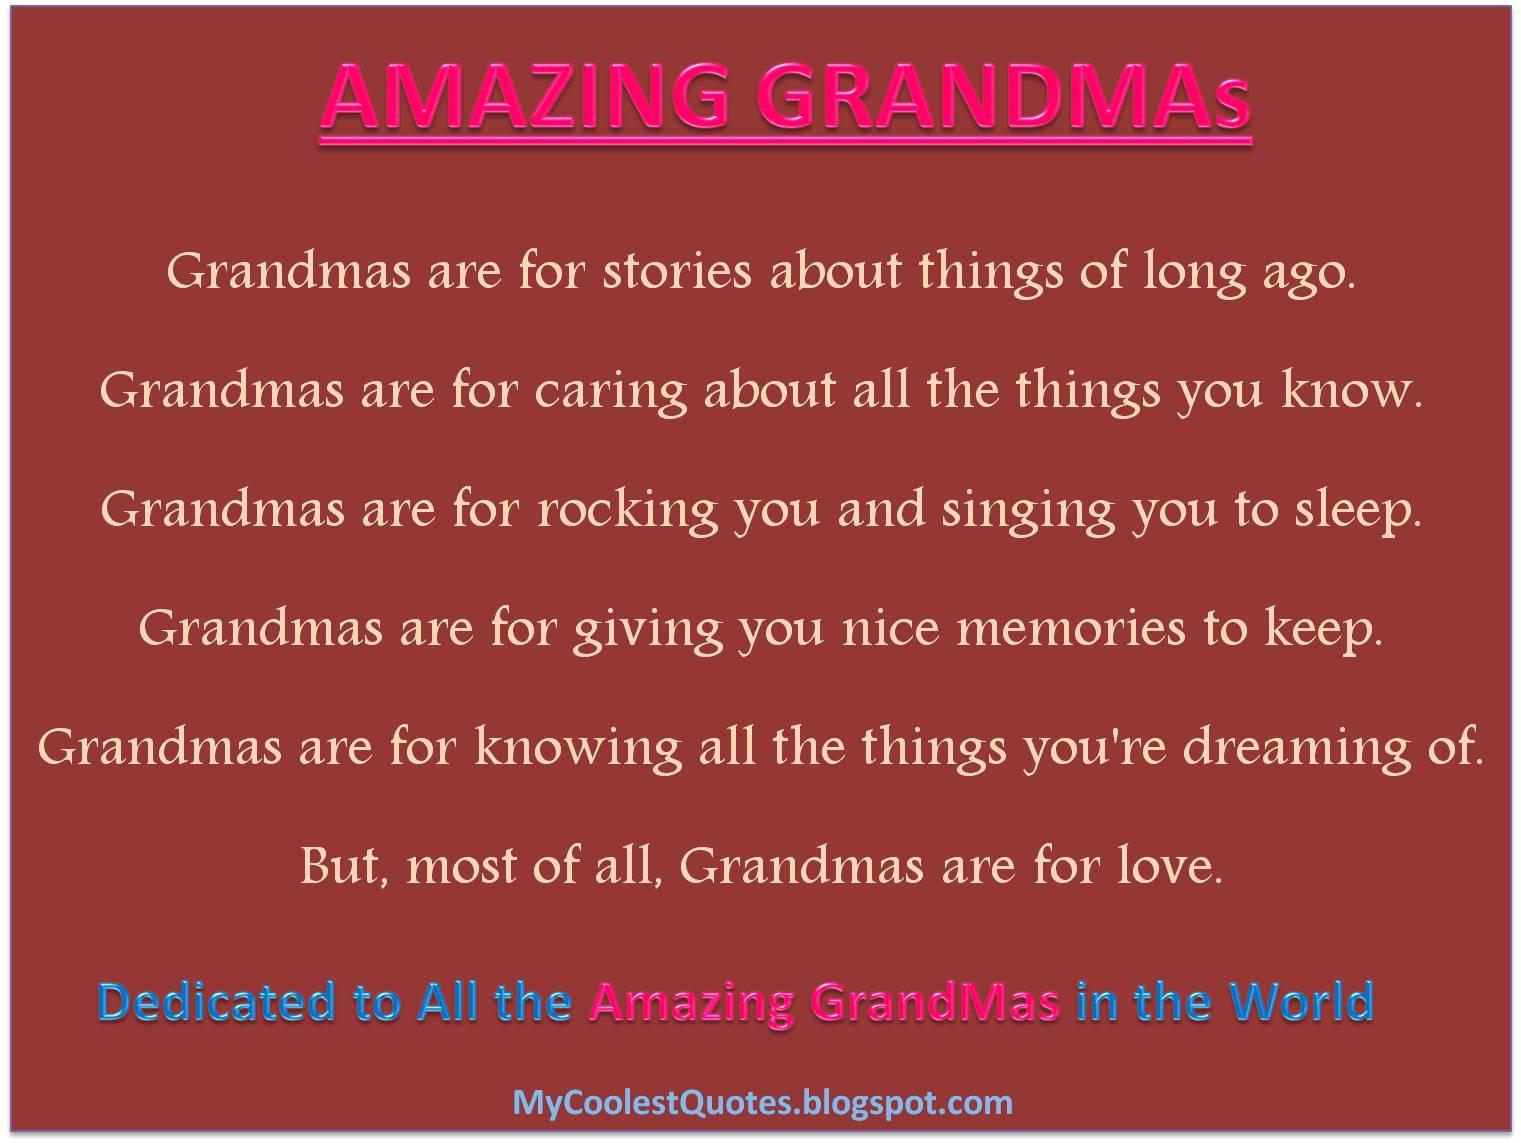 Quotes about Amazing grandmas (24 quotes)